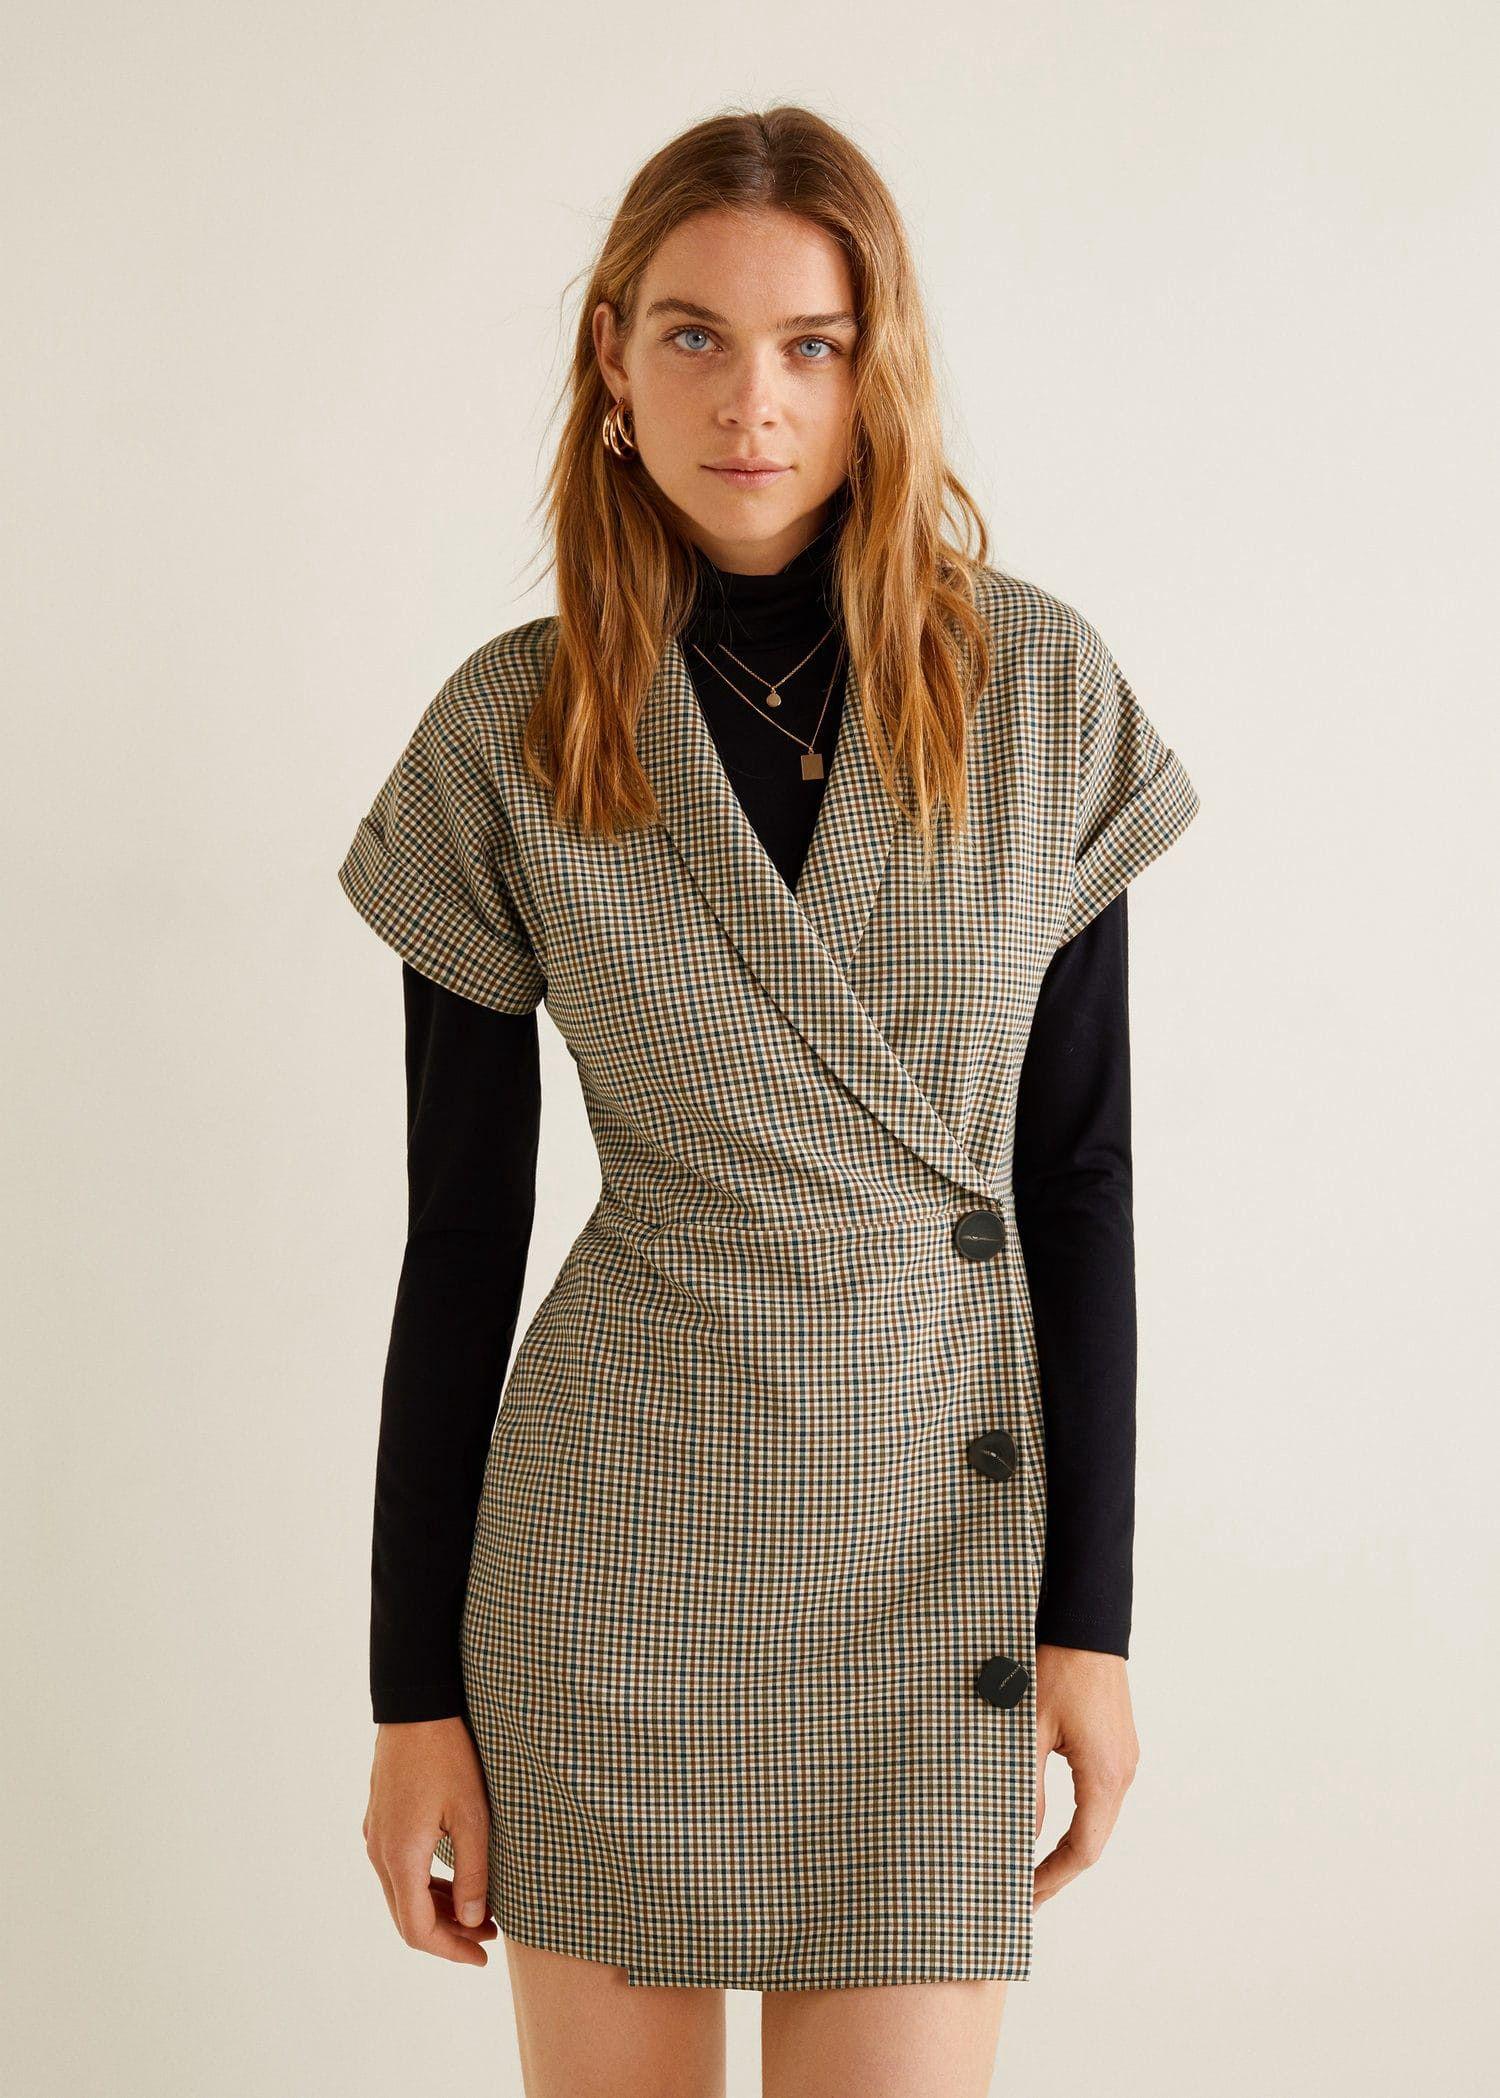 Mango Check Wrap Dress - 8   Products   Dresses, Wrap Dress, Fall ... be7b2c4dcb